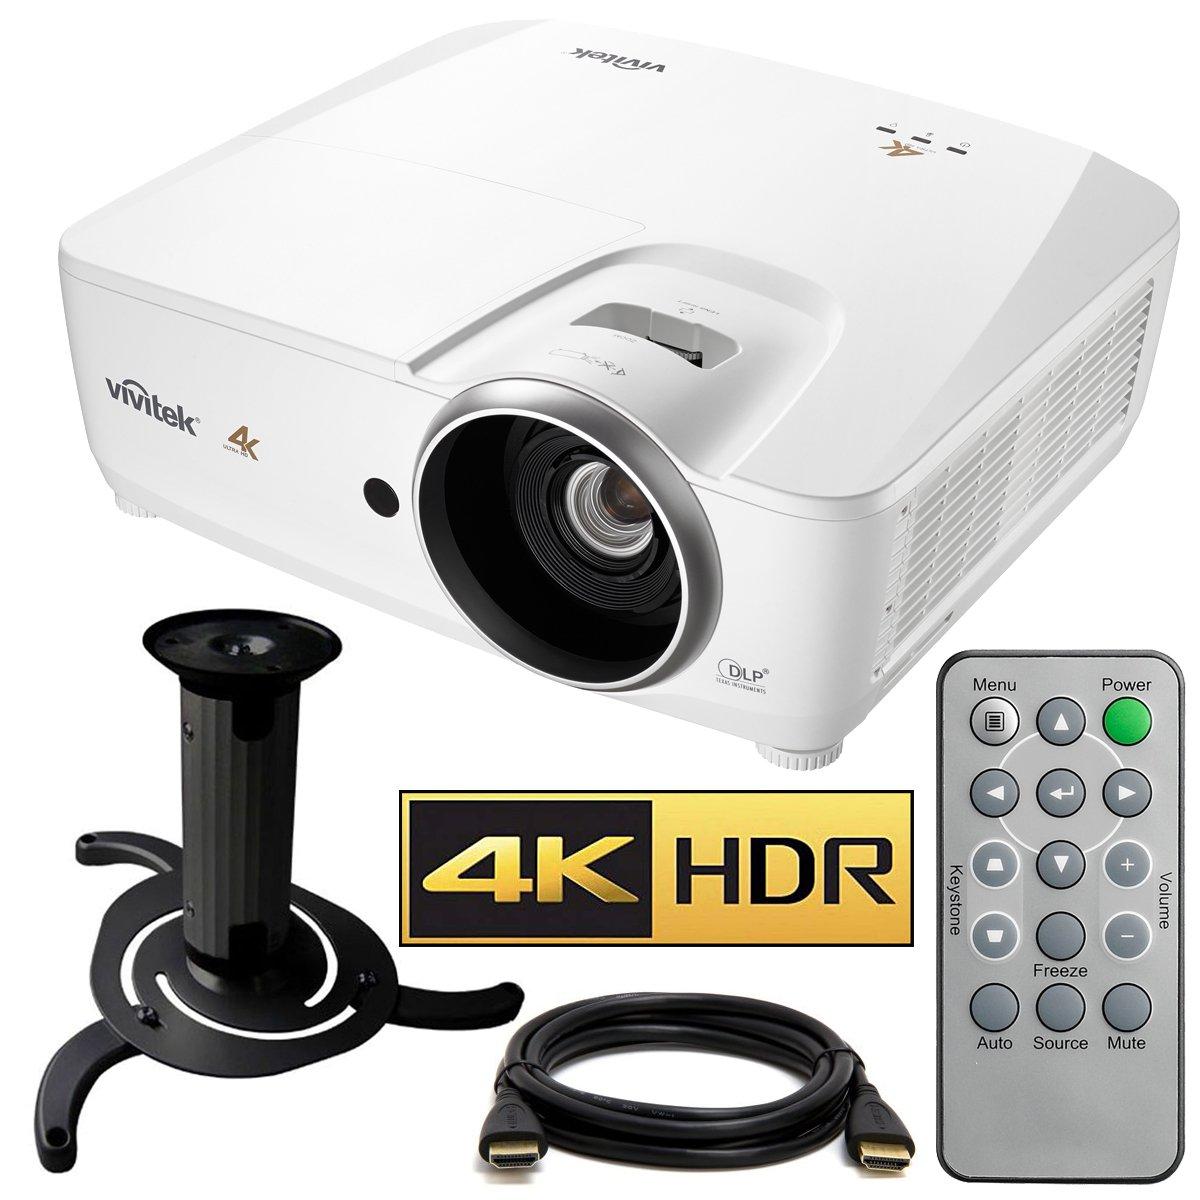 Vivitek HK2288 4K DLP Projector with High Dynamic Range (White) with Ceiling Bracket Bundle